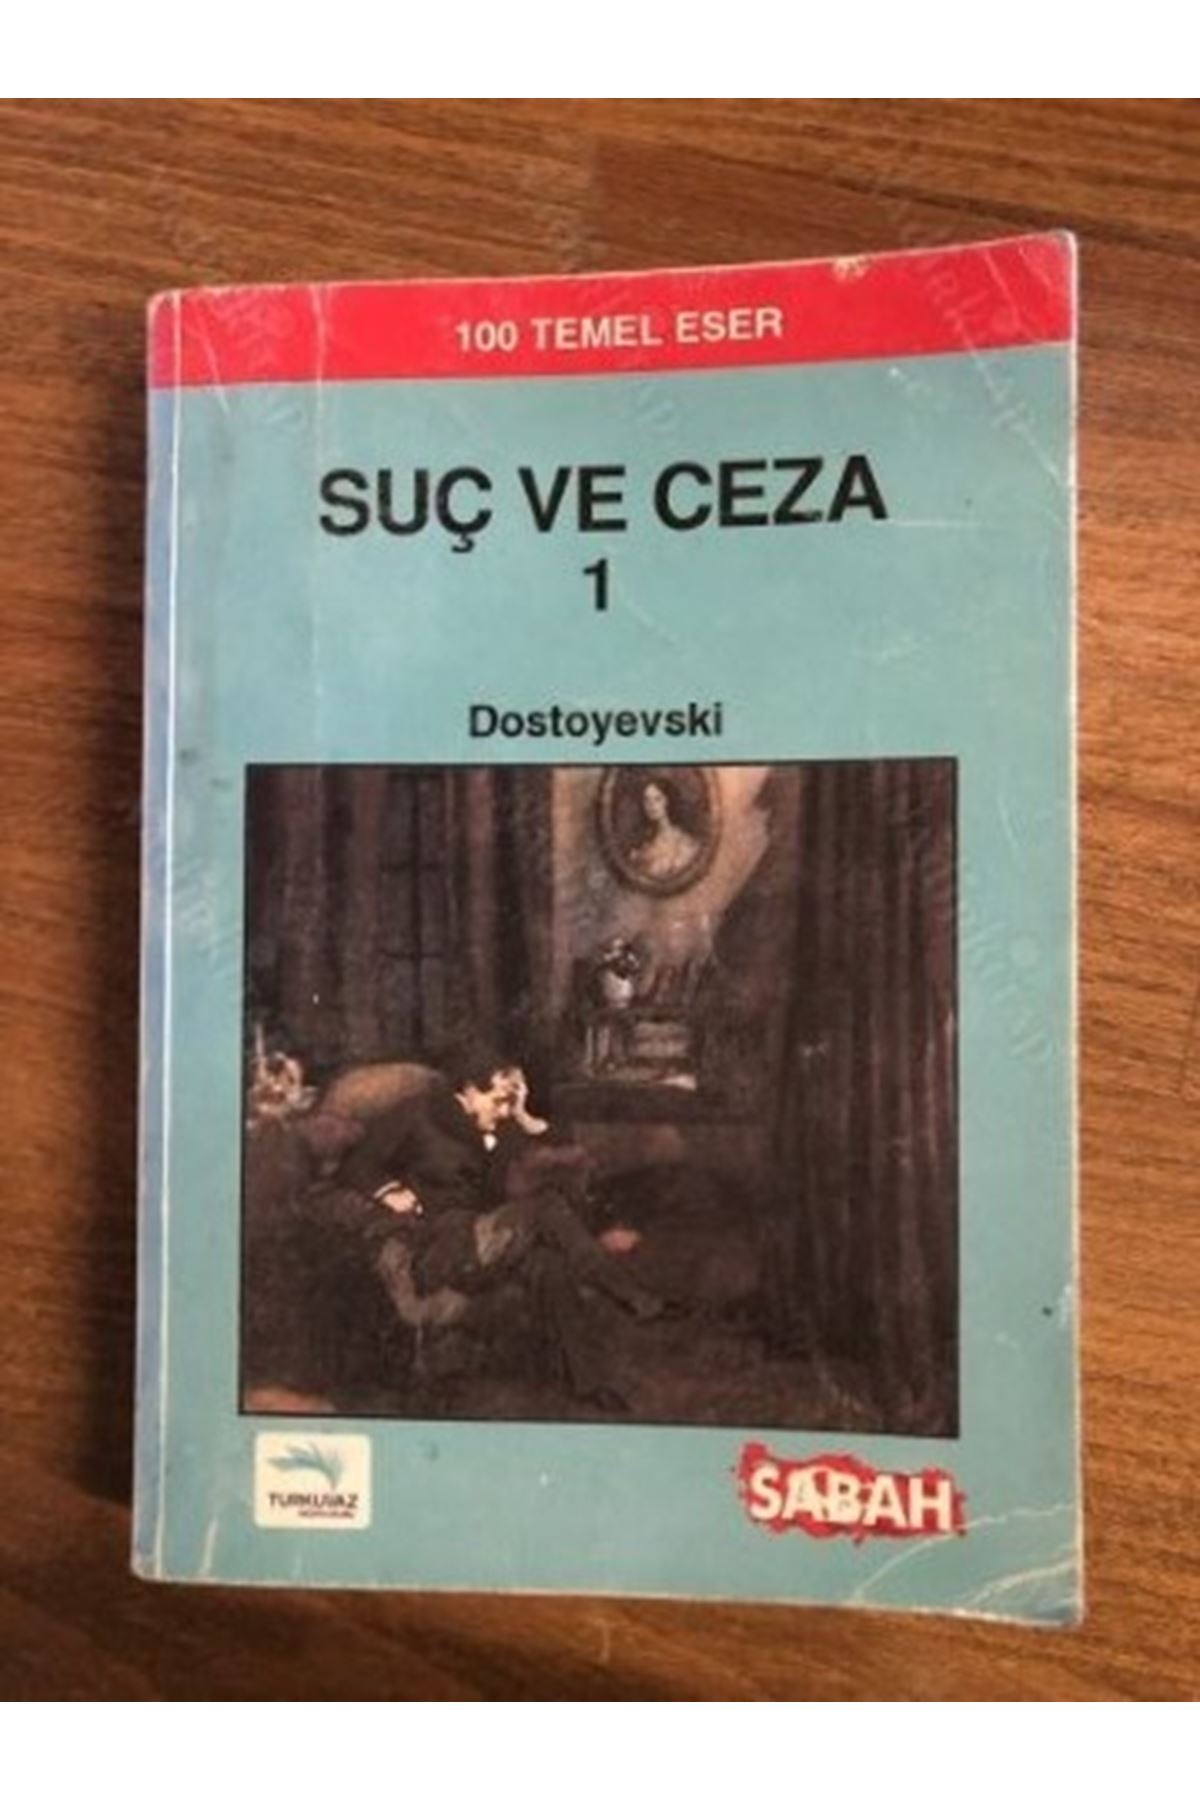 DOSTOYEVSKİ - SUÇ VE CEZA 1